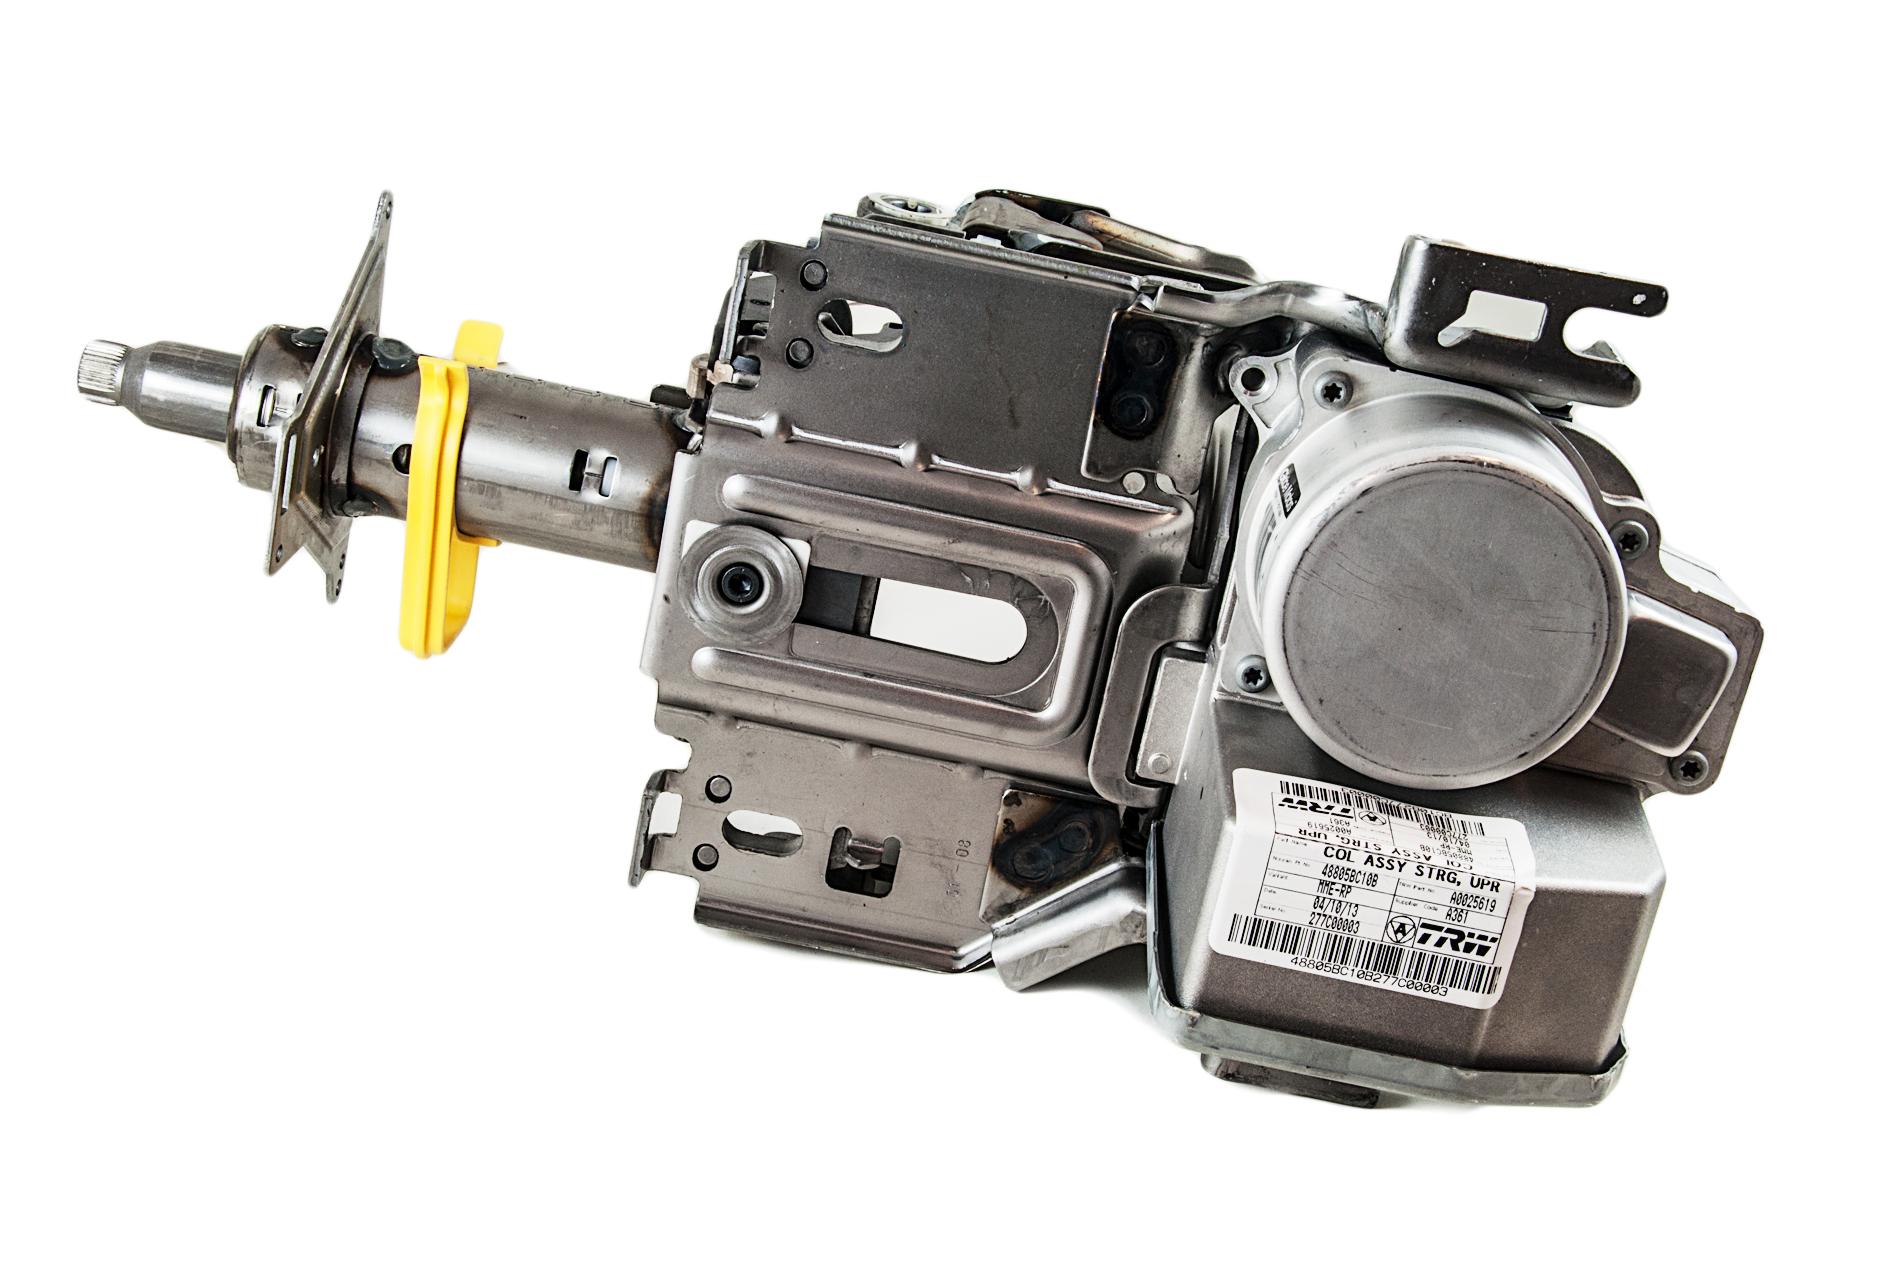 Nissan Genuine Micra K12 Electric Power Steering System Column 48805bc10b Ebay